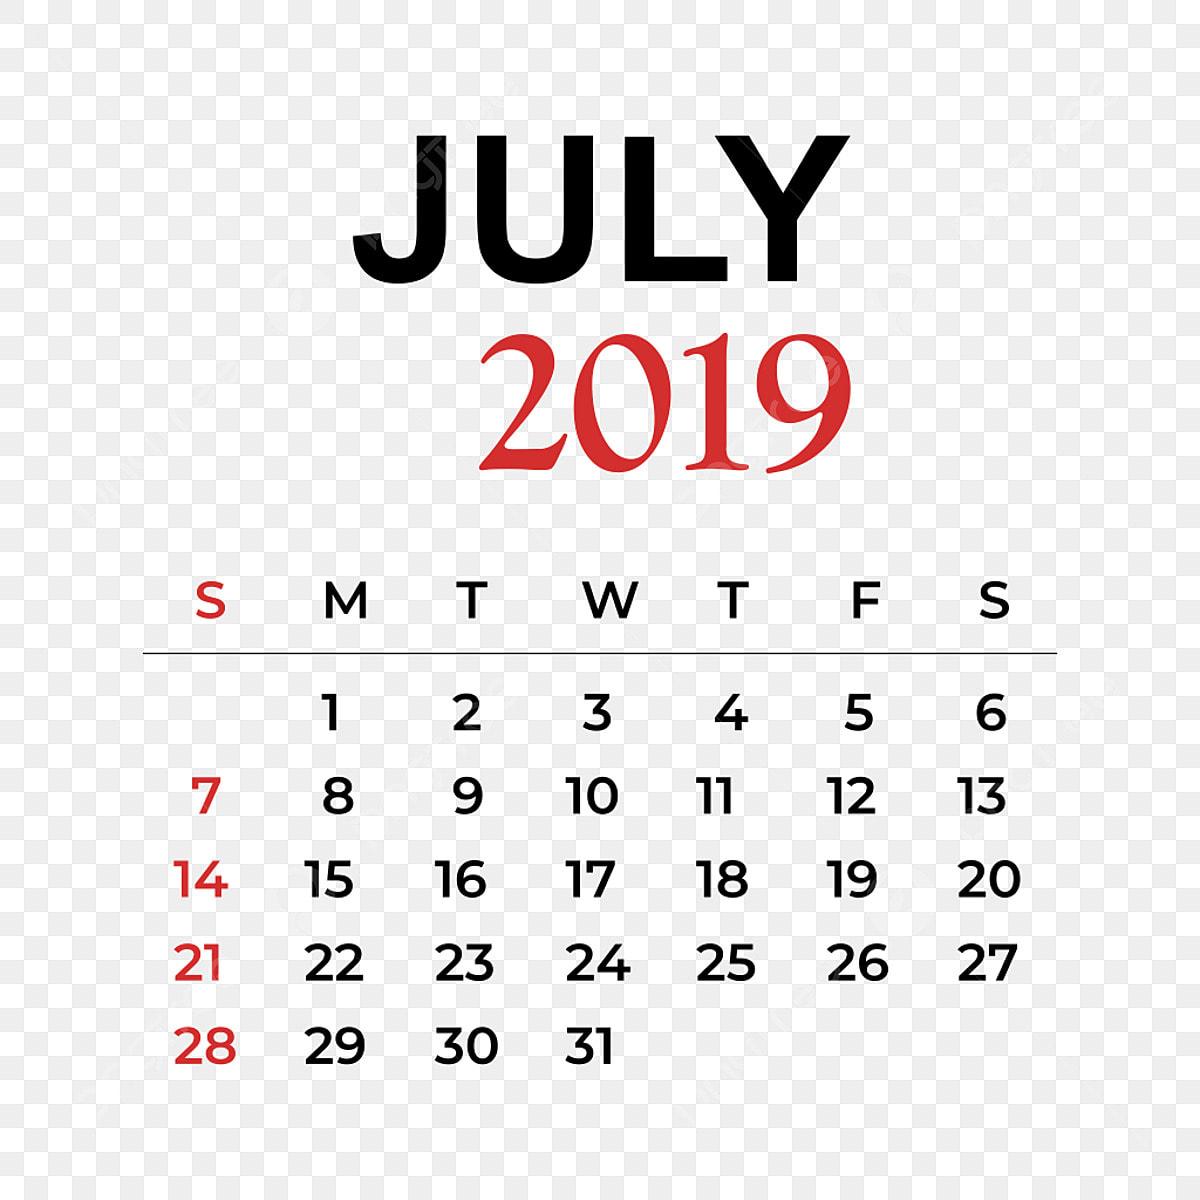 Calendario 2019 Illustrator.2019 Calendar July Month Calendar Year Week Png And